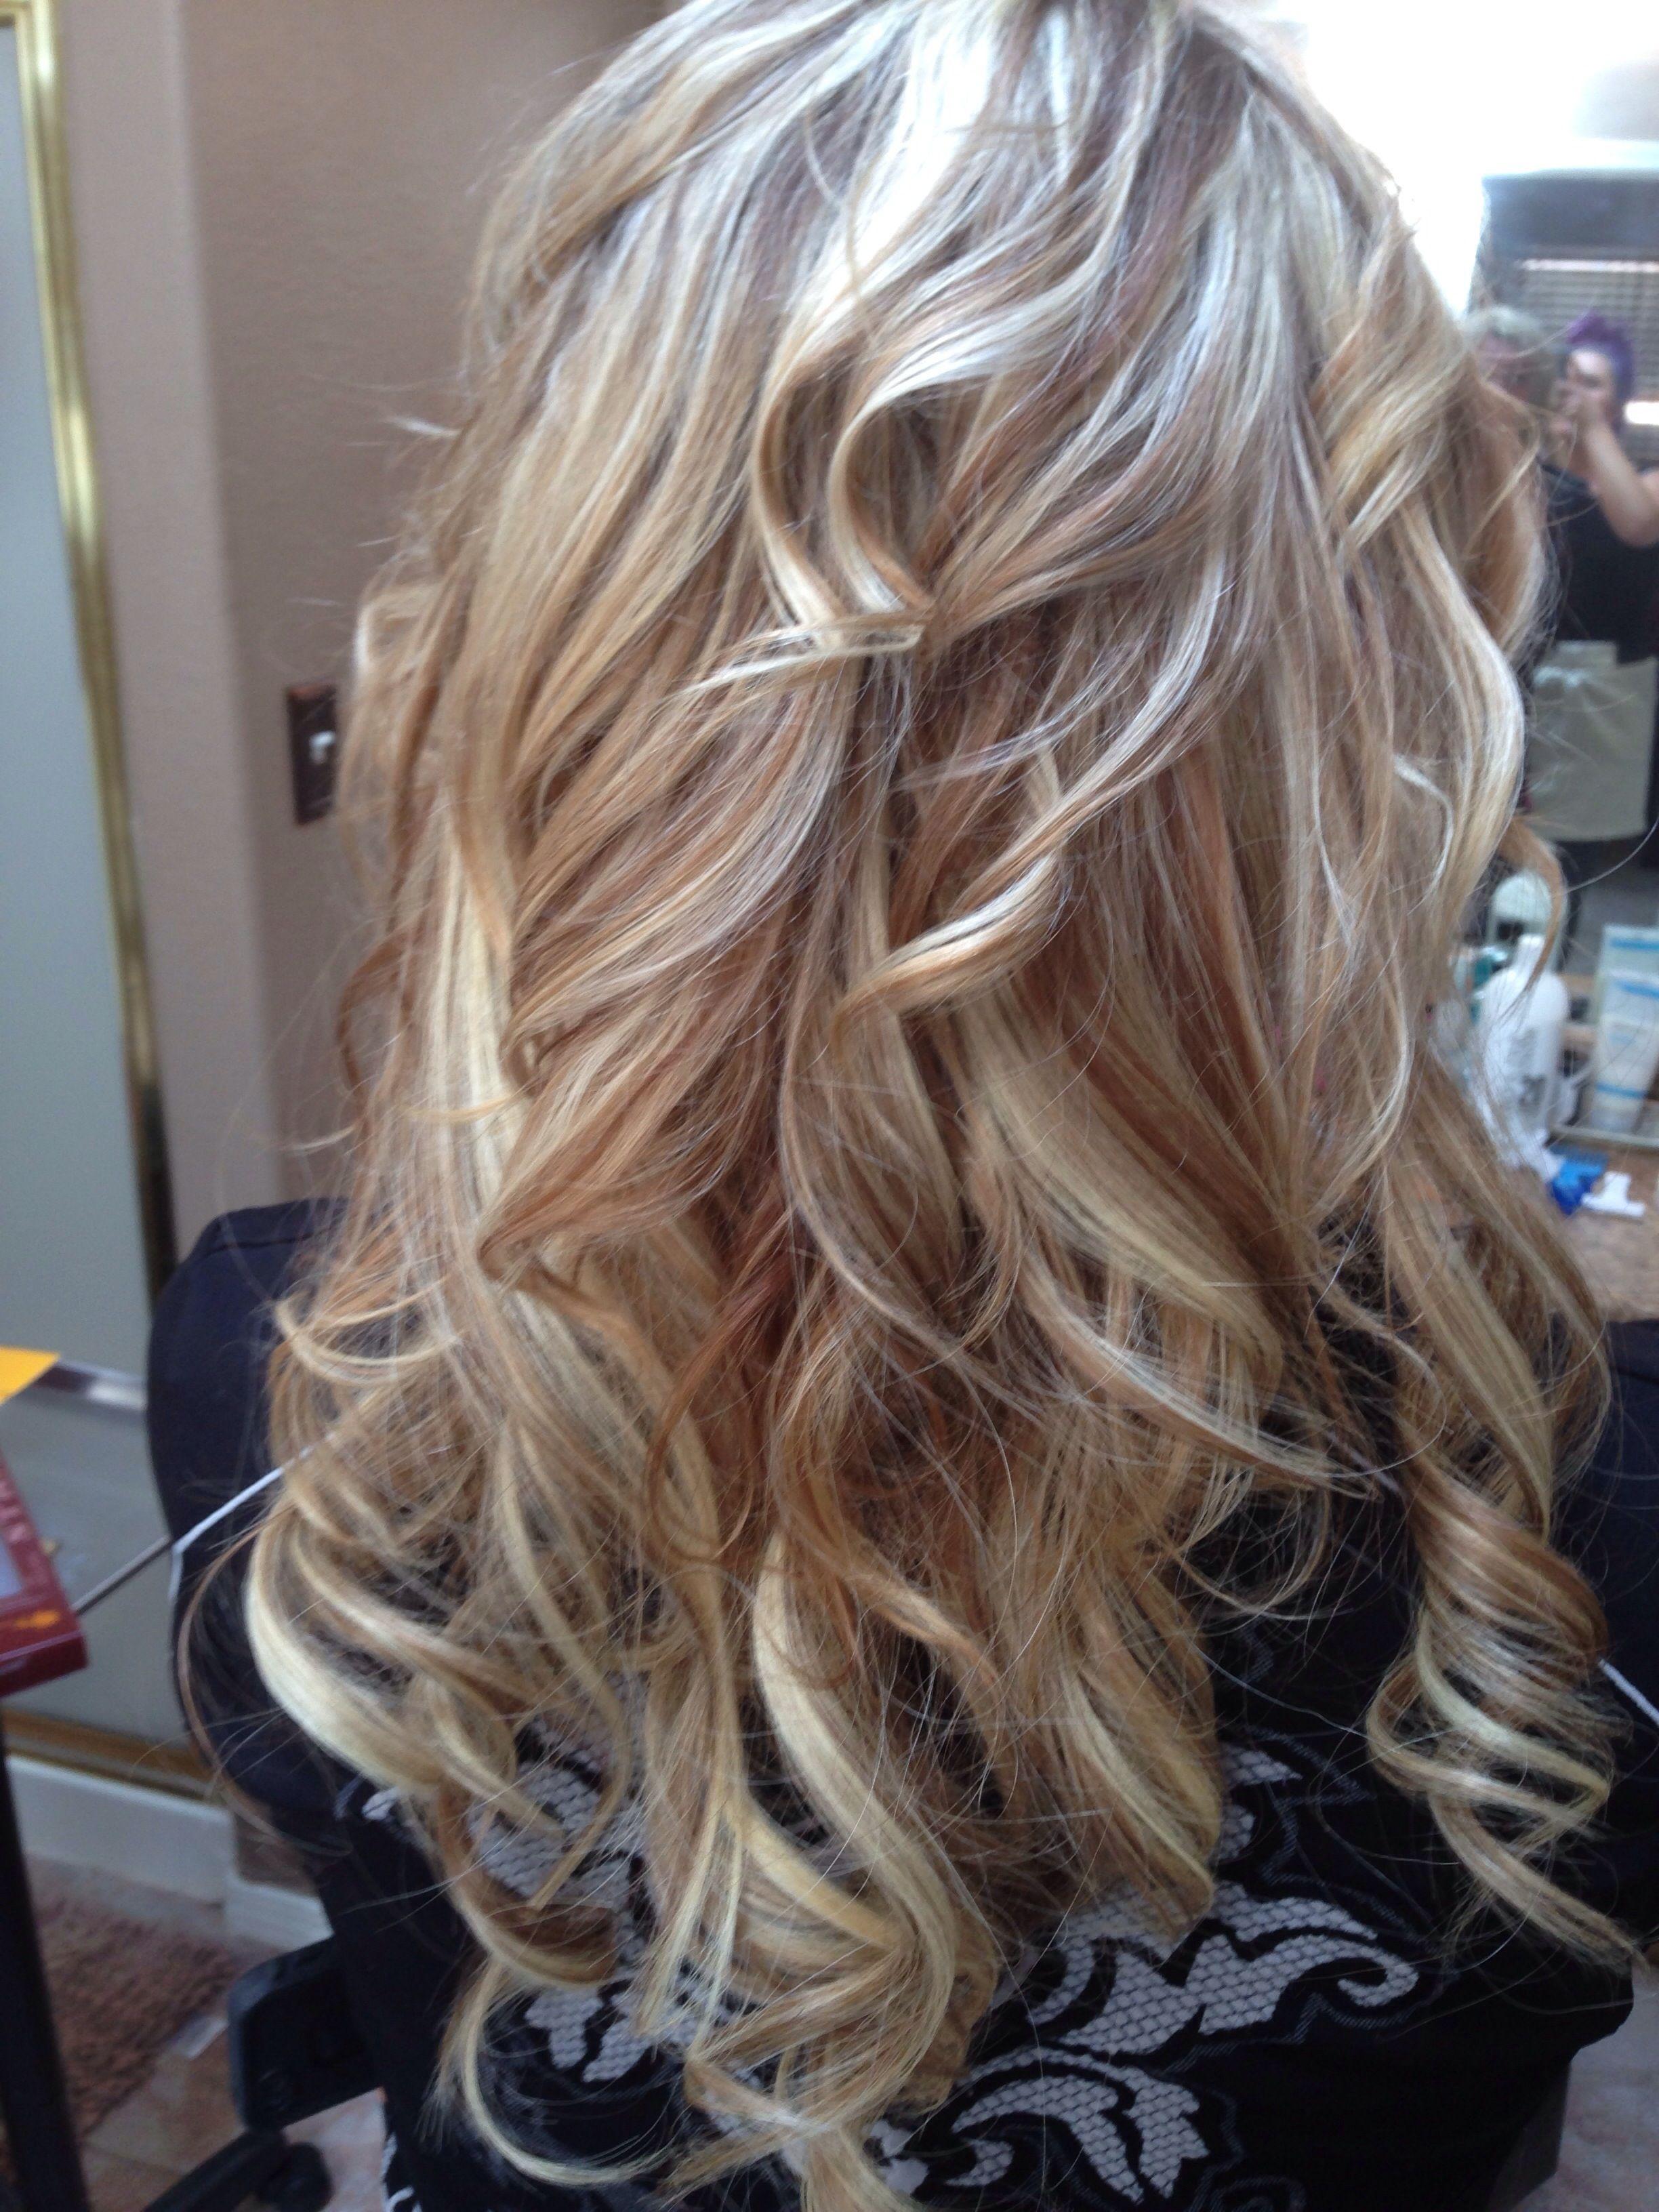 Dimensional blonde | My life as a hAir StYliSt | Pinterest ...